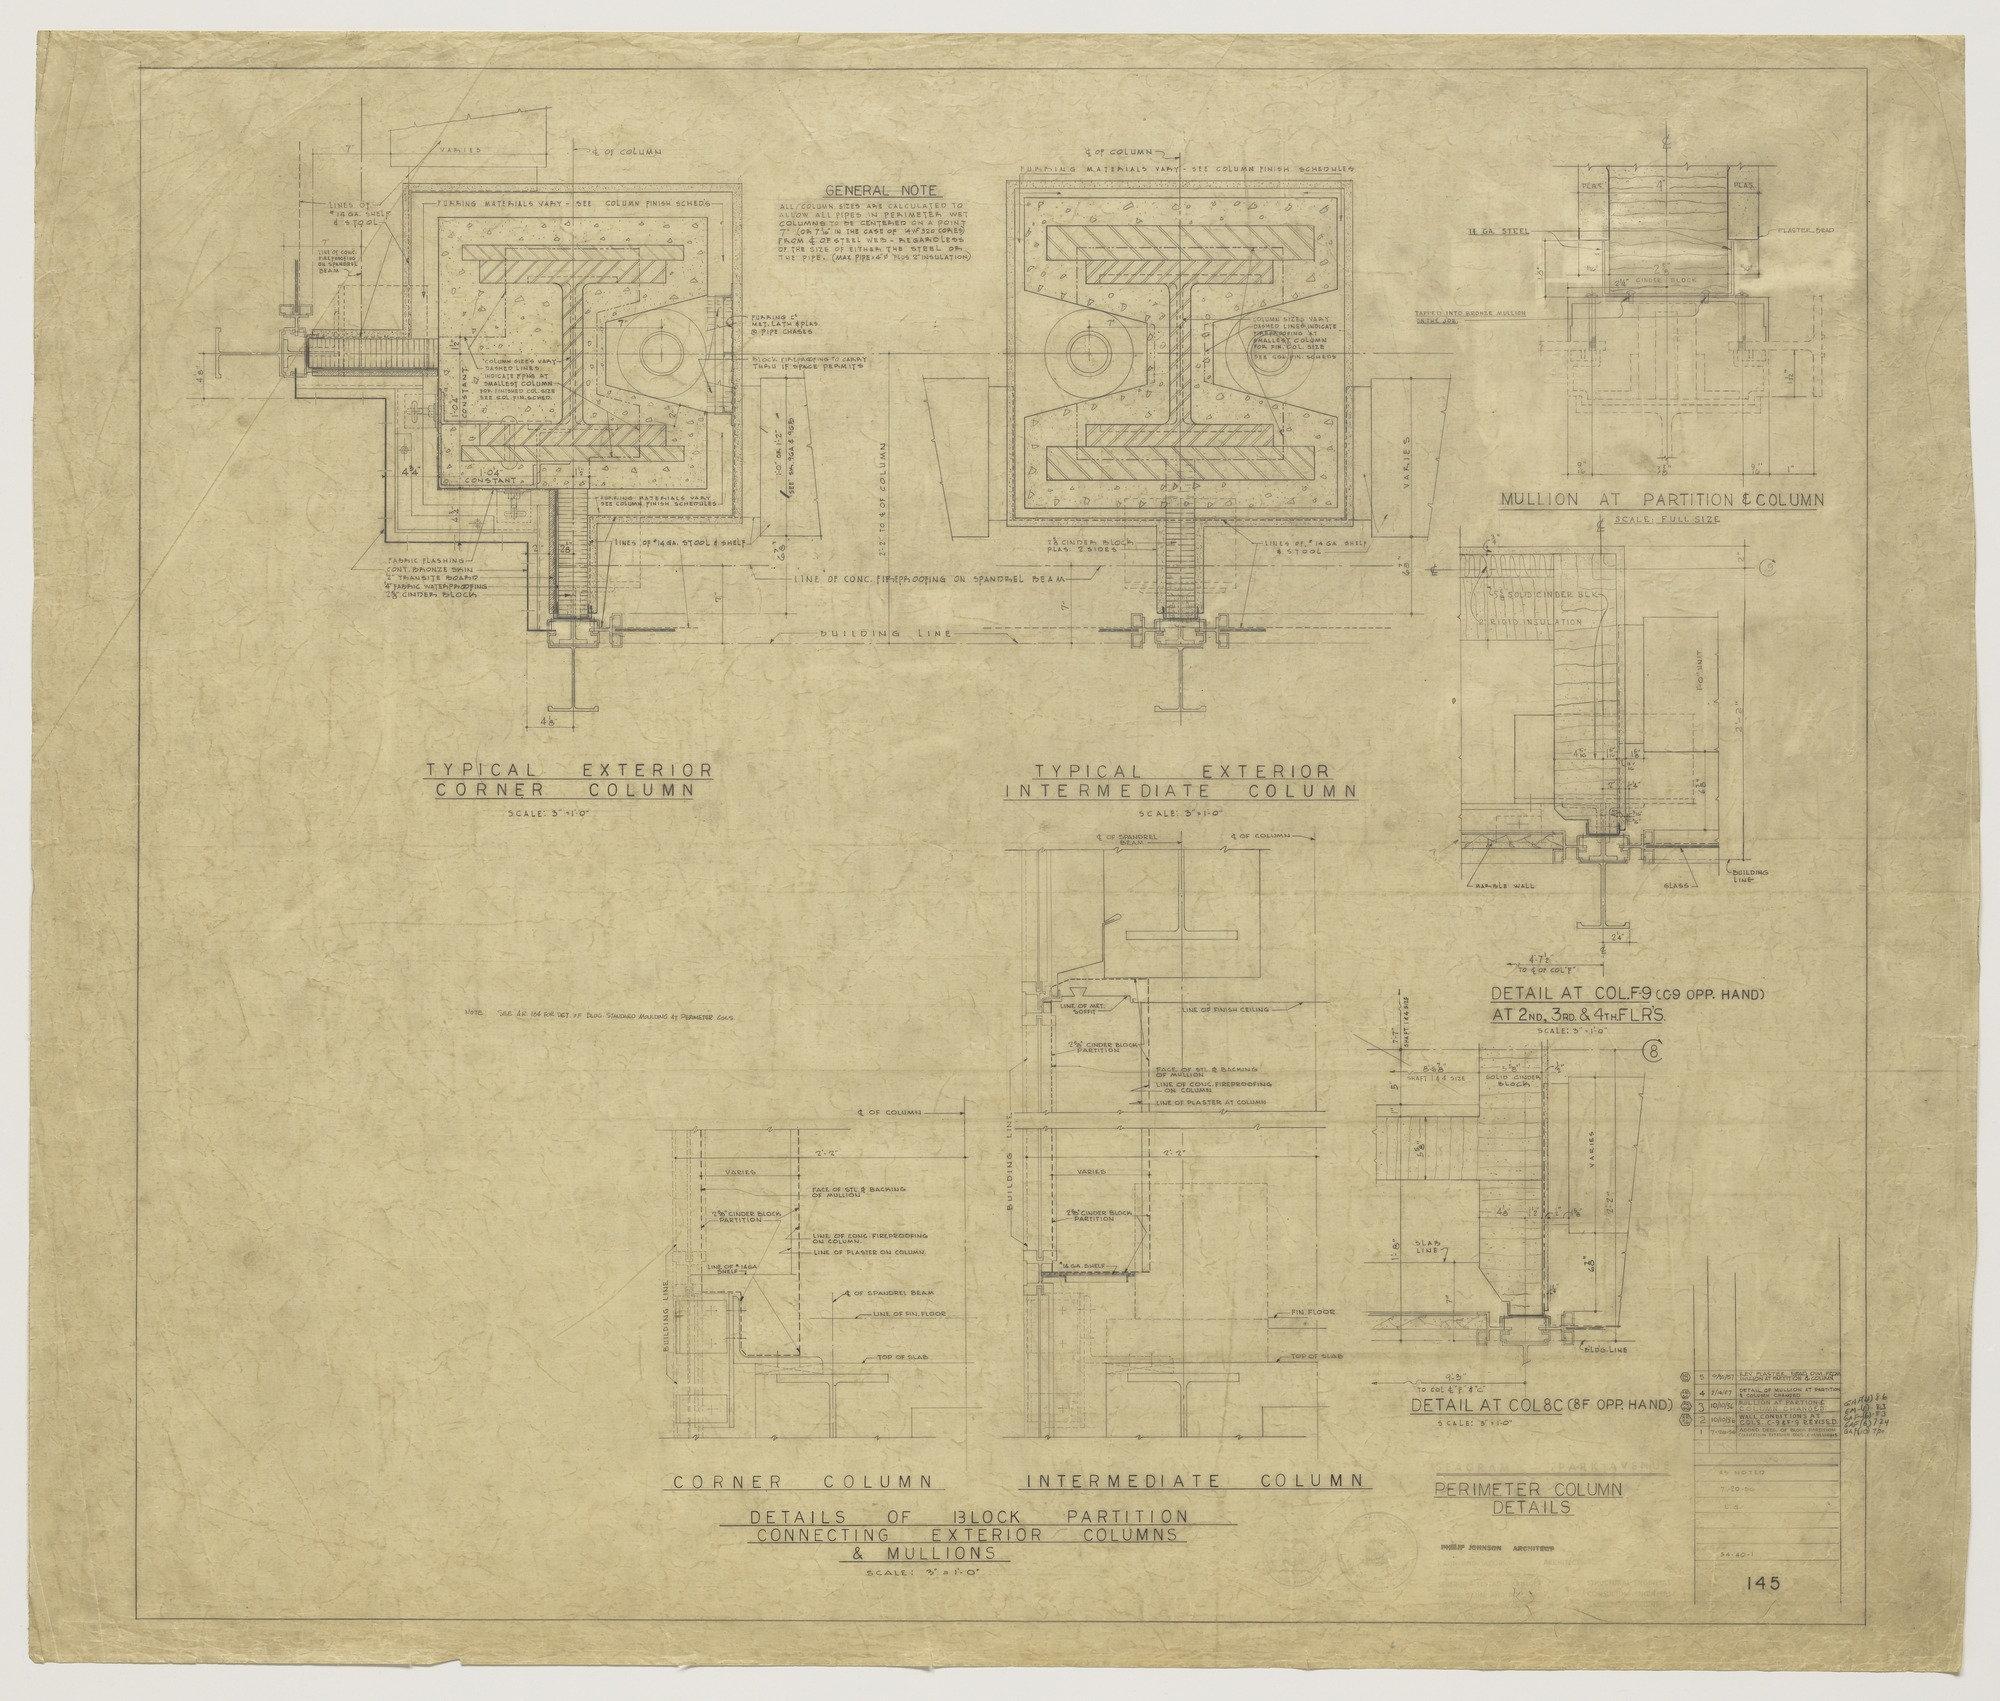 ludwig mies van der rohe with philip johnson kahn jacobs seagram